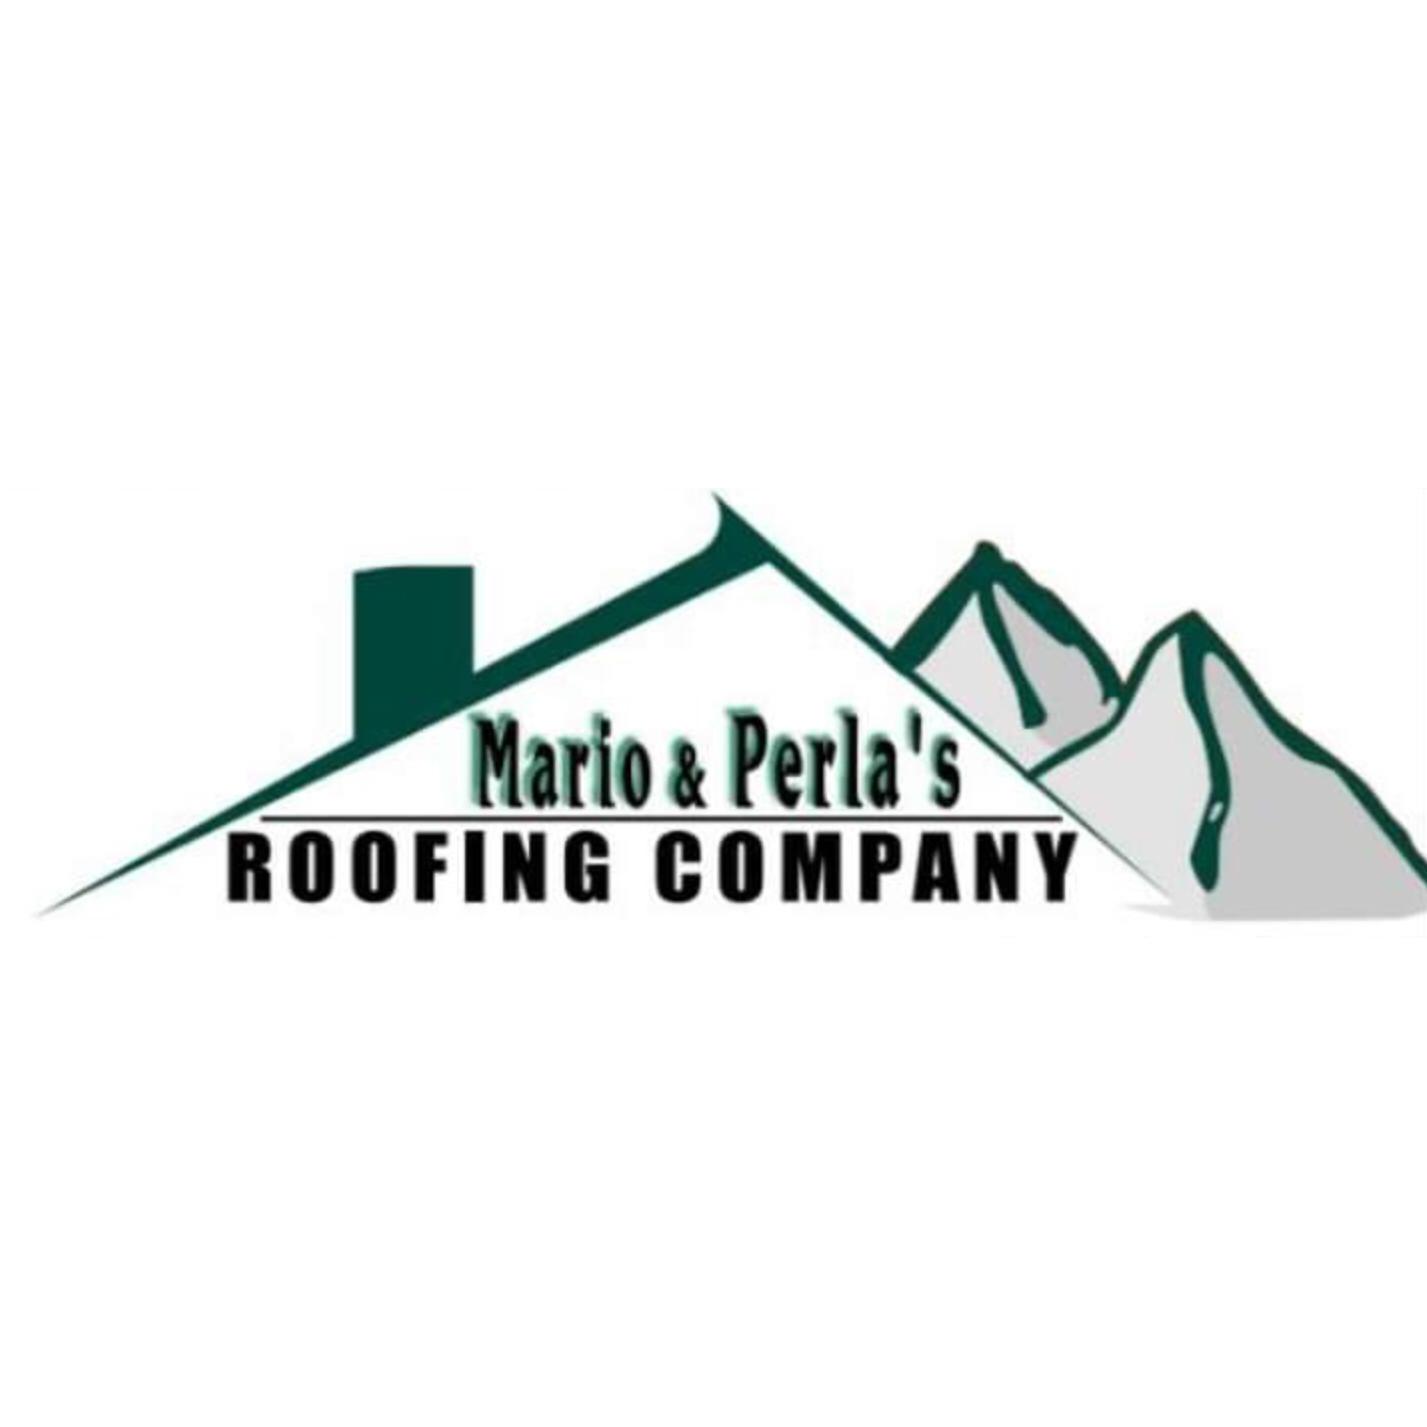 Mario and Perla's Roofing Company